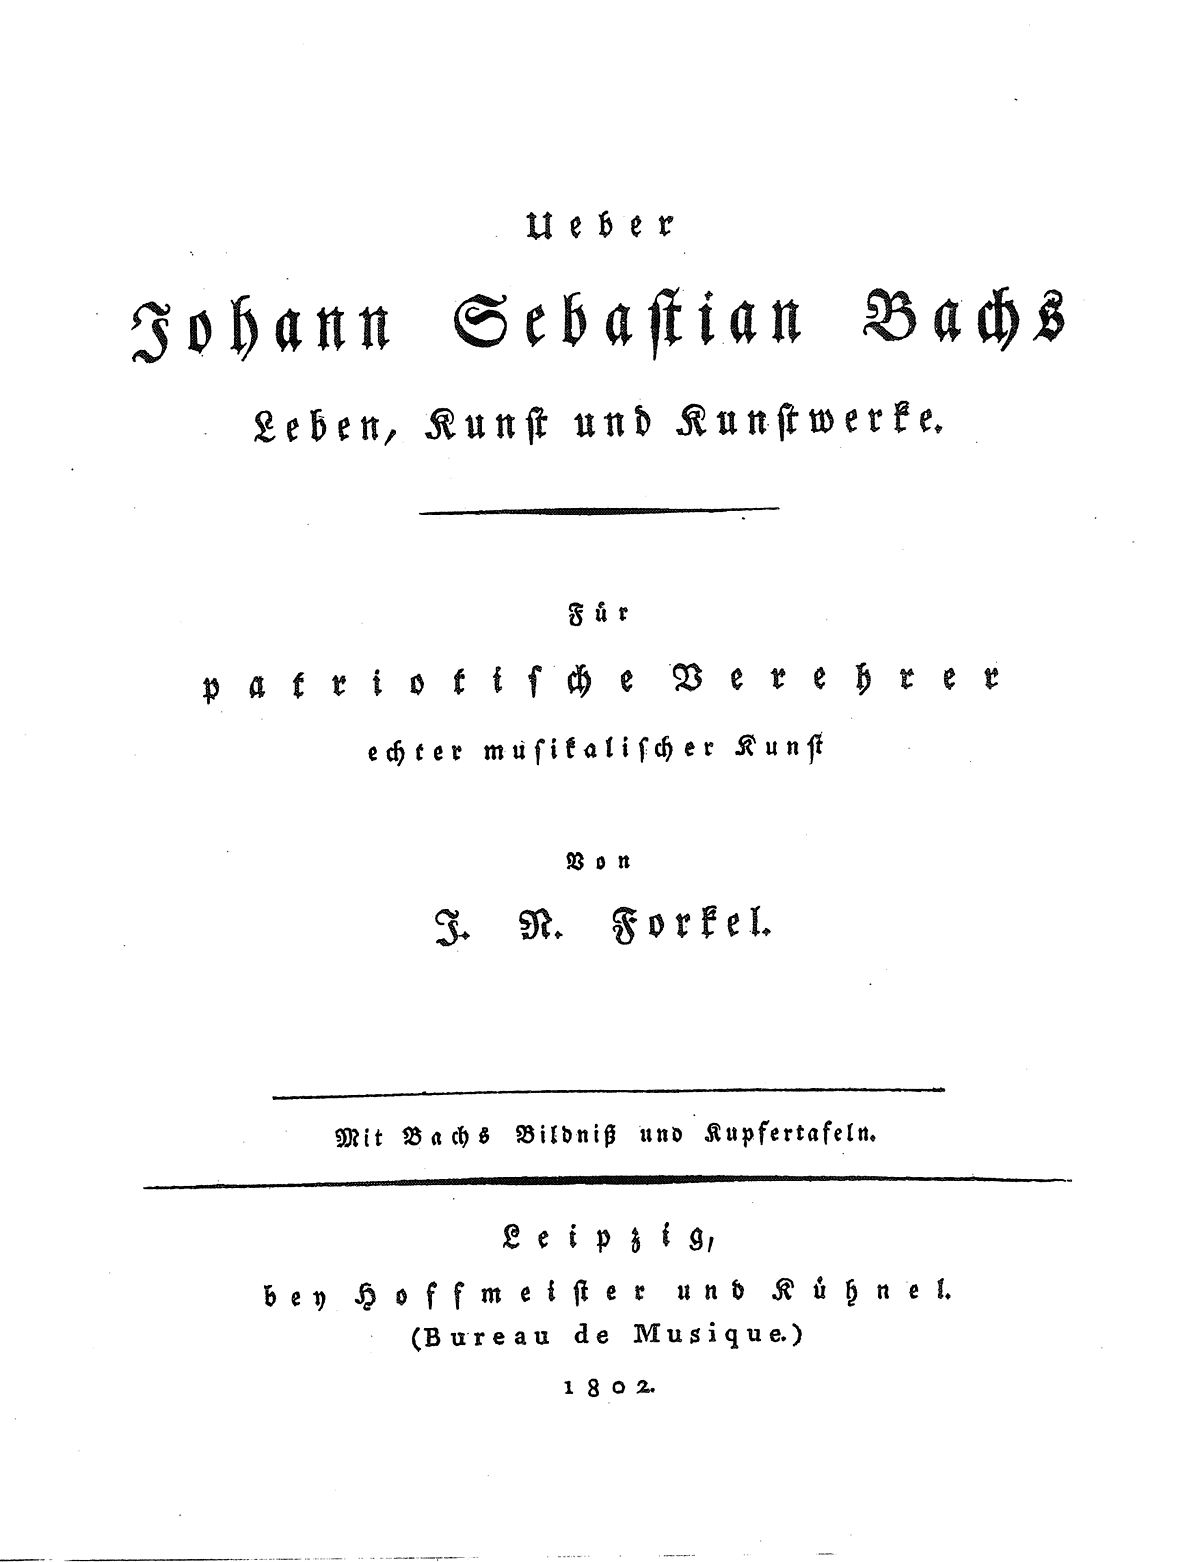 johann sebastian bach his life art and work wikipedia - Johann Sebastian Bach Lebenslauf